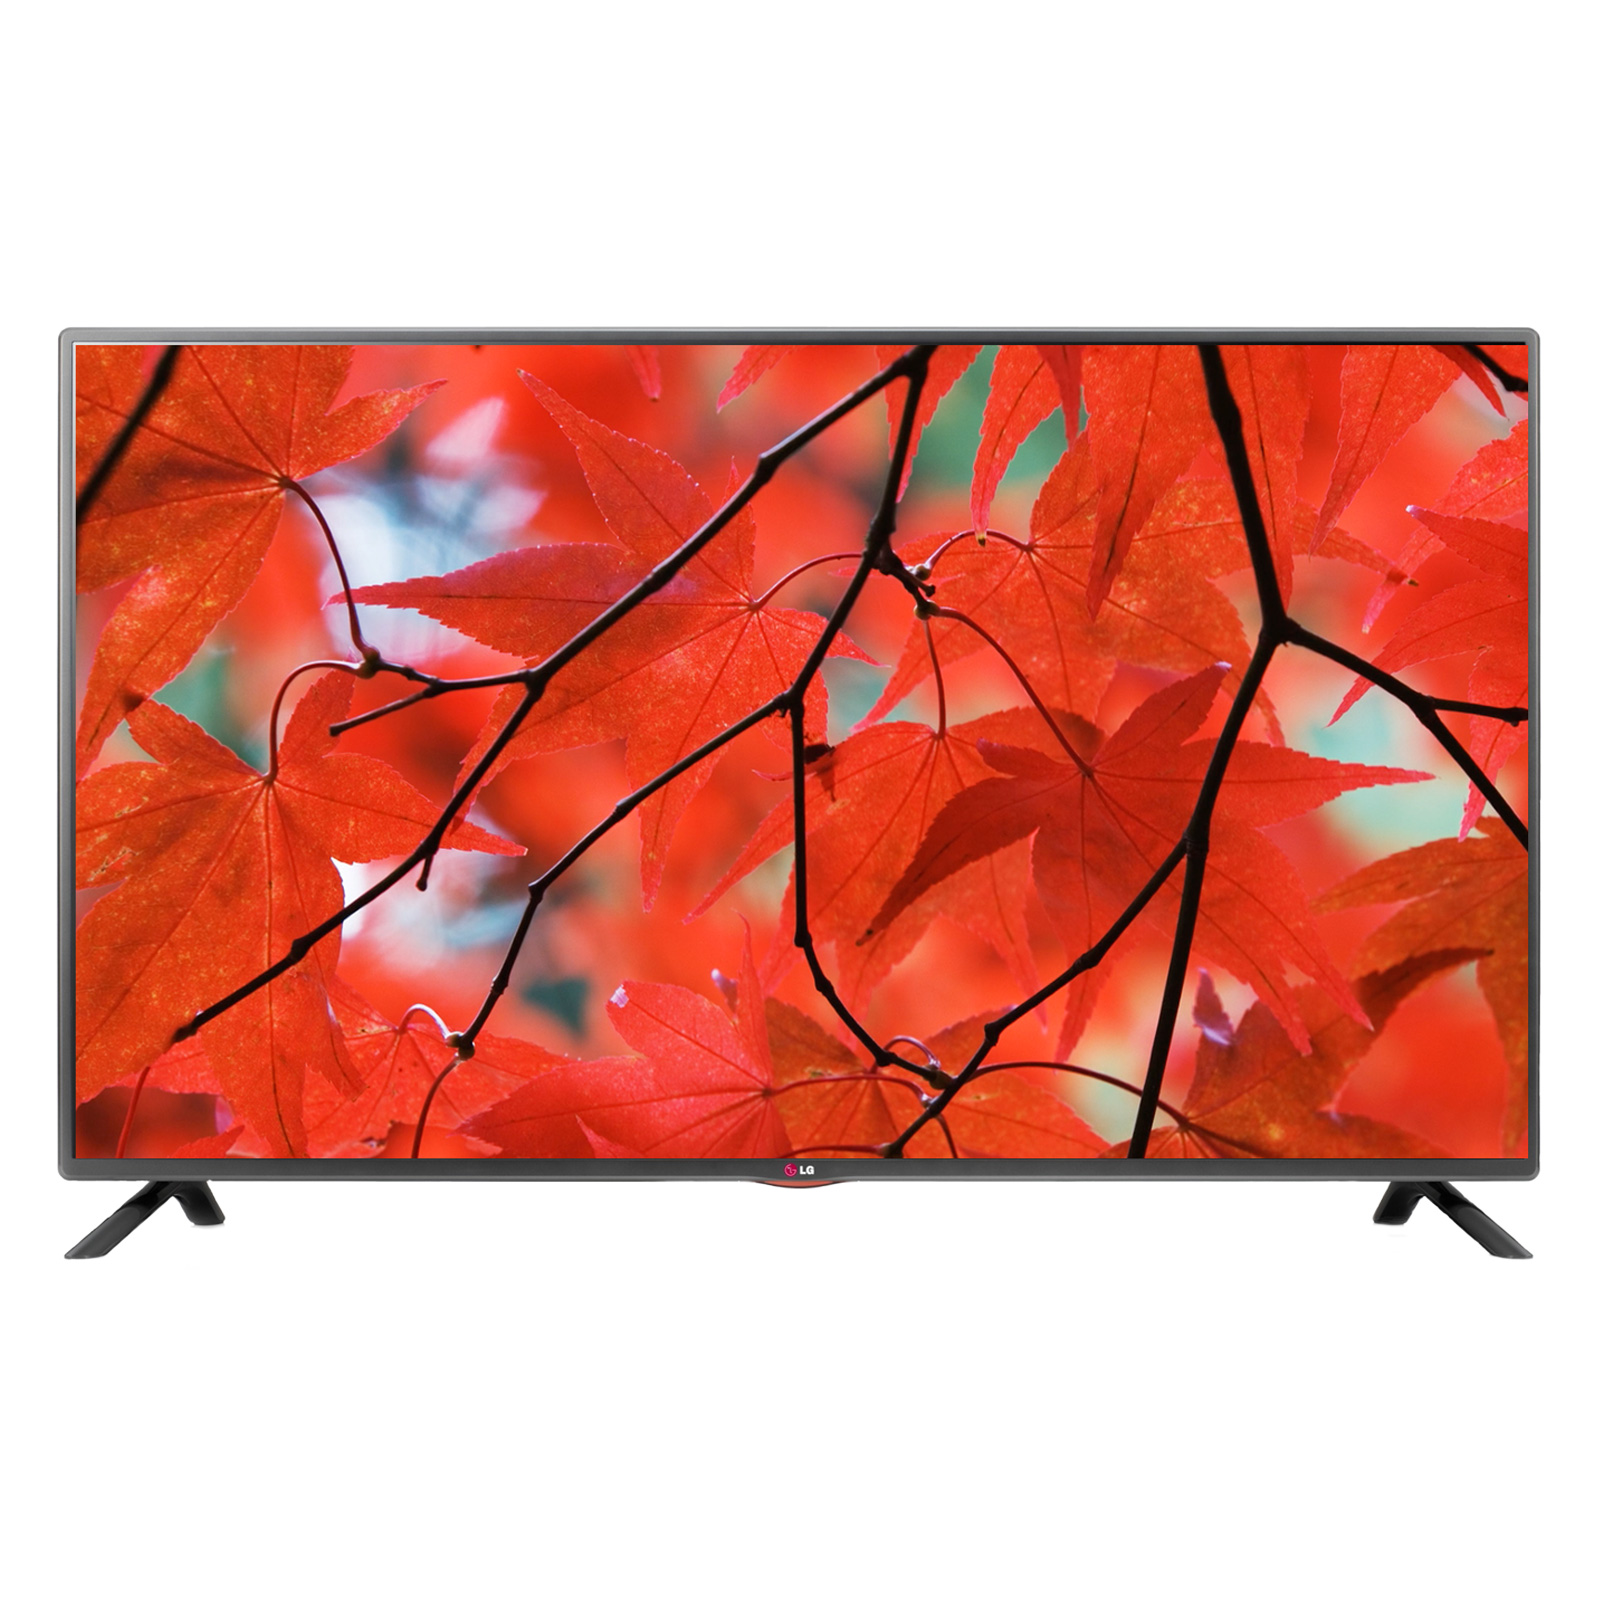 LG 32LB561B TV LG Sur LDLC